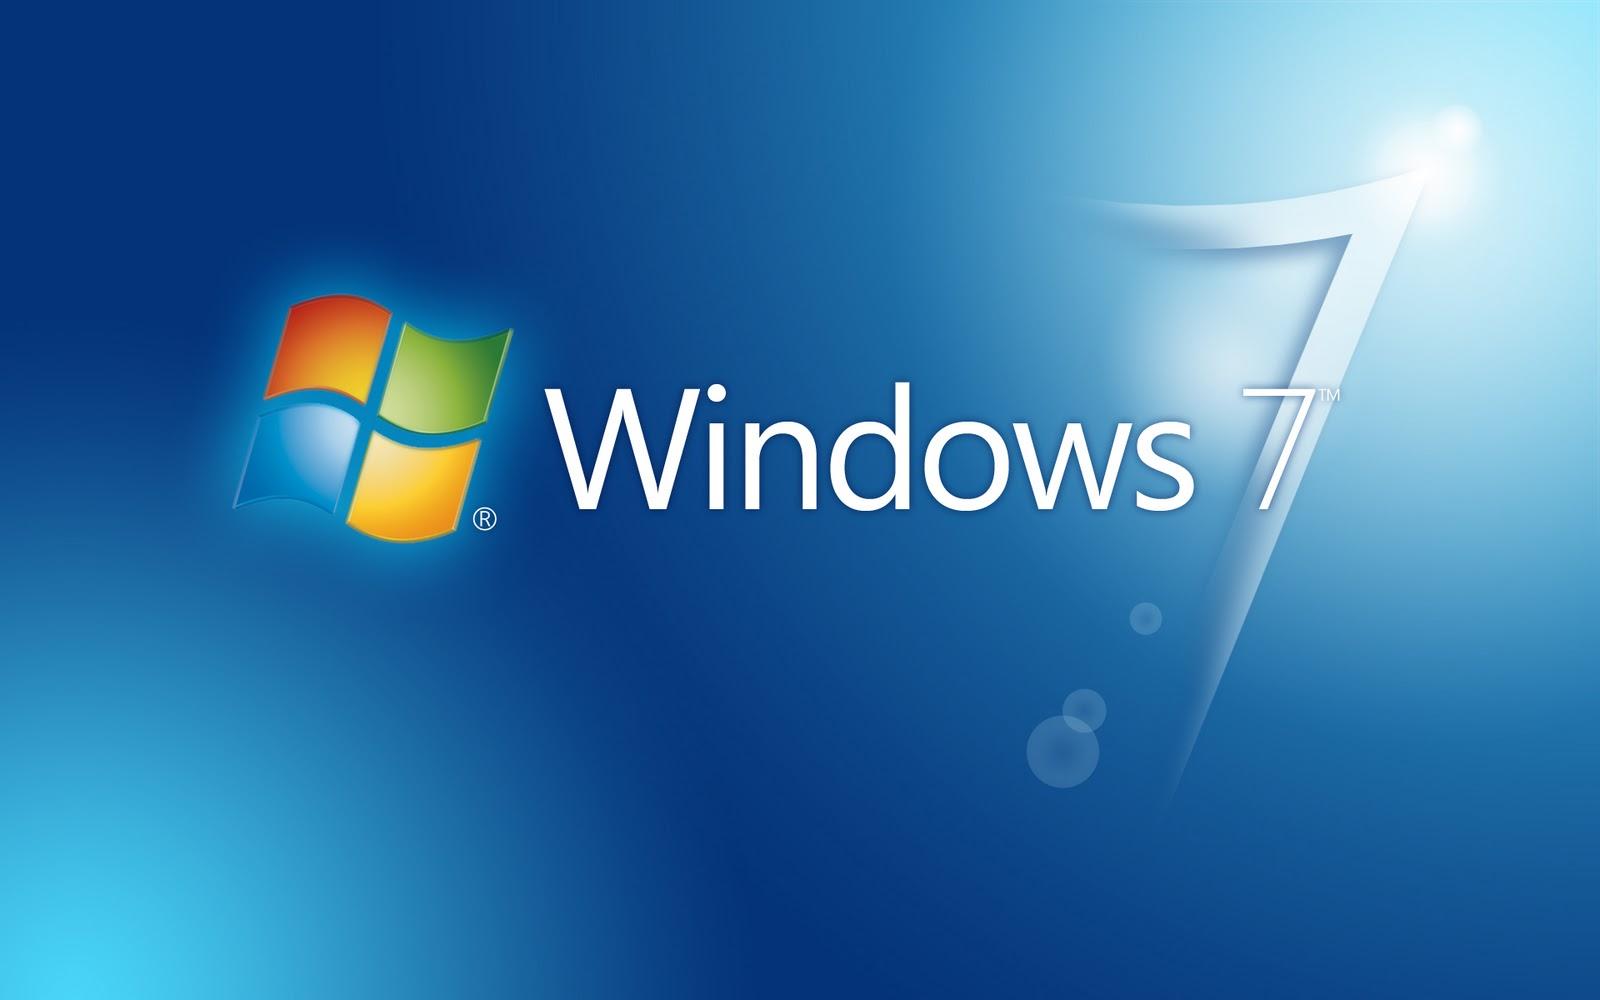 Software Management Tools Aid Windows 7 Migration